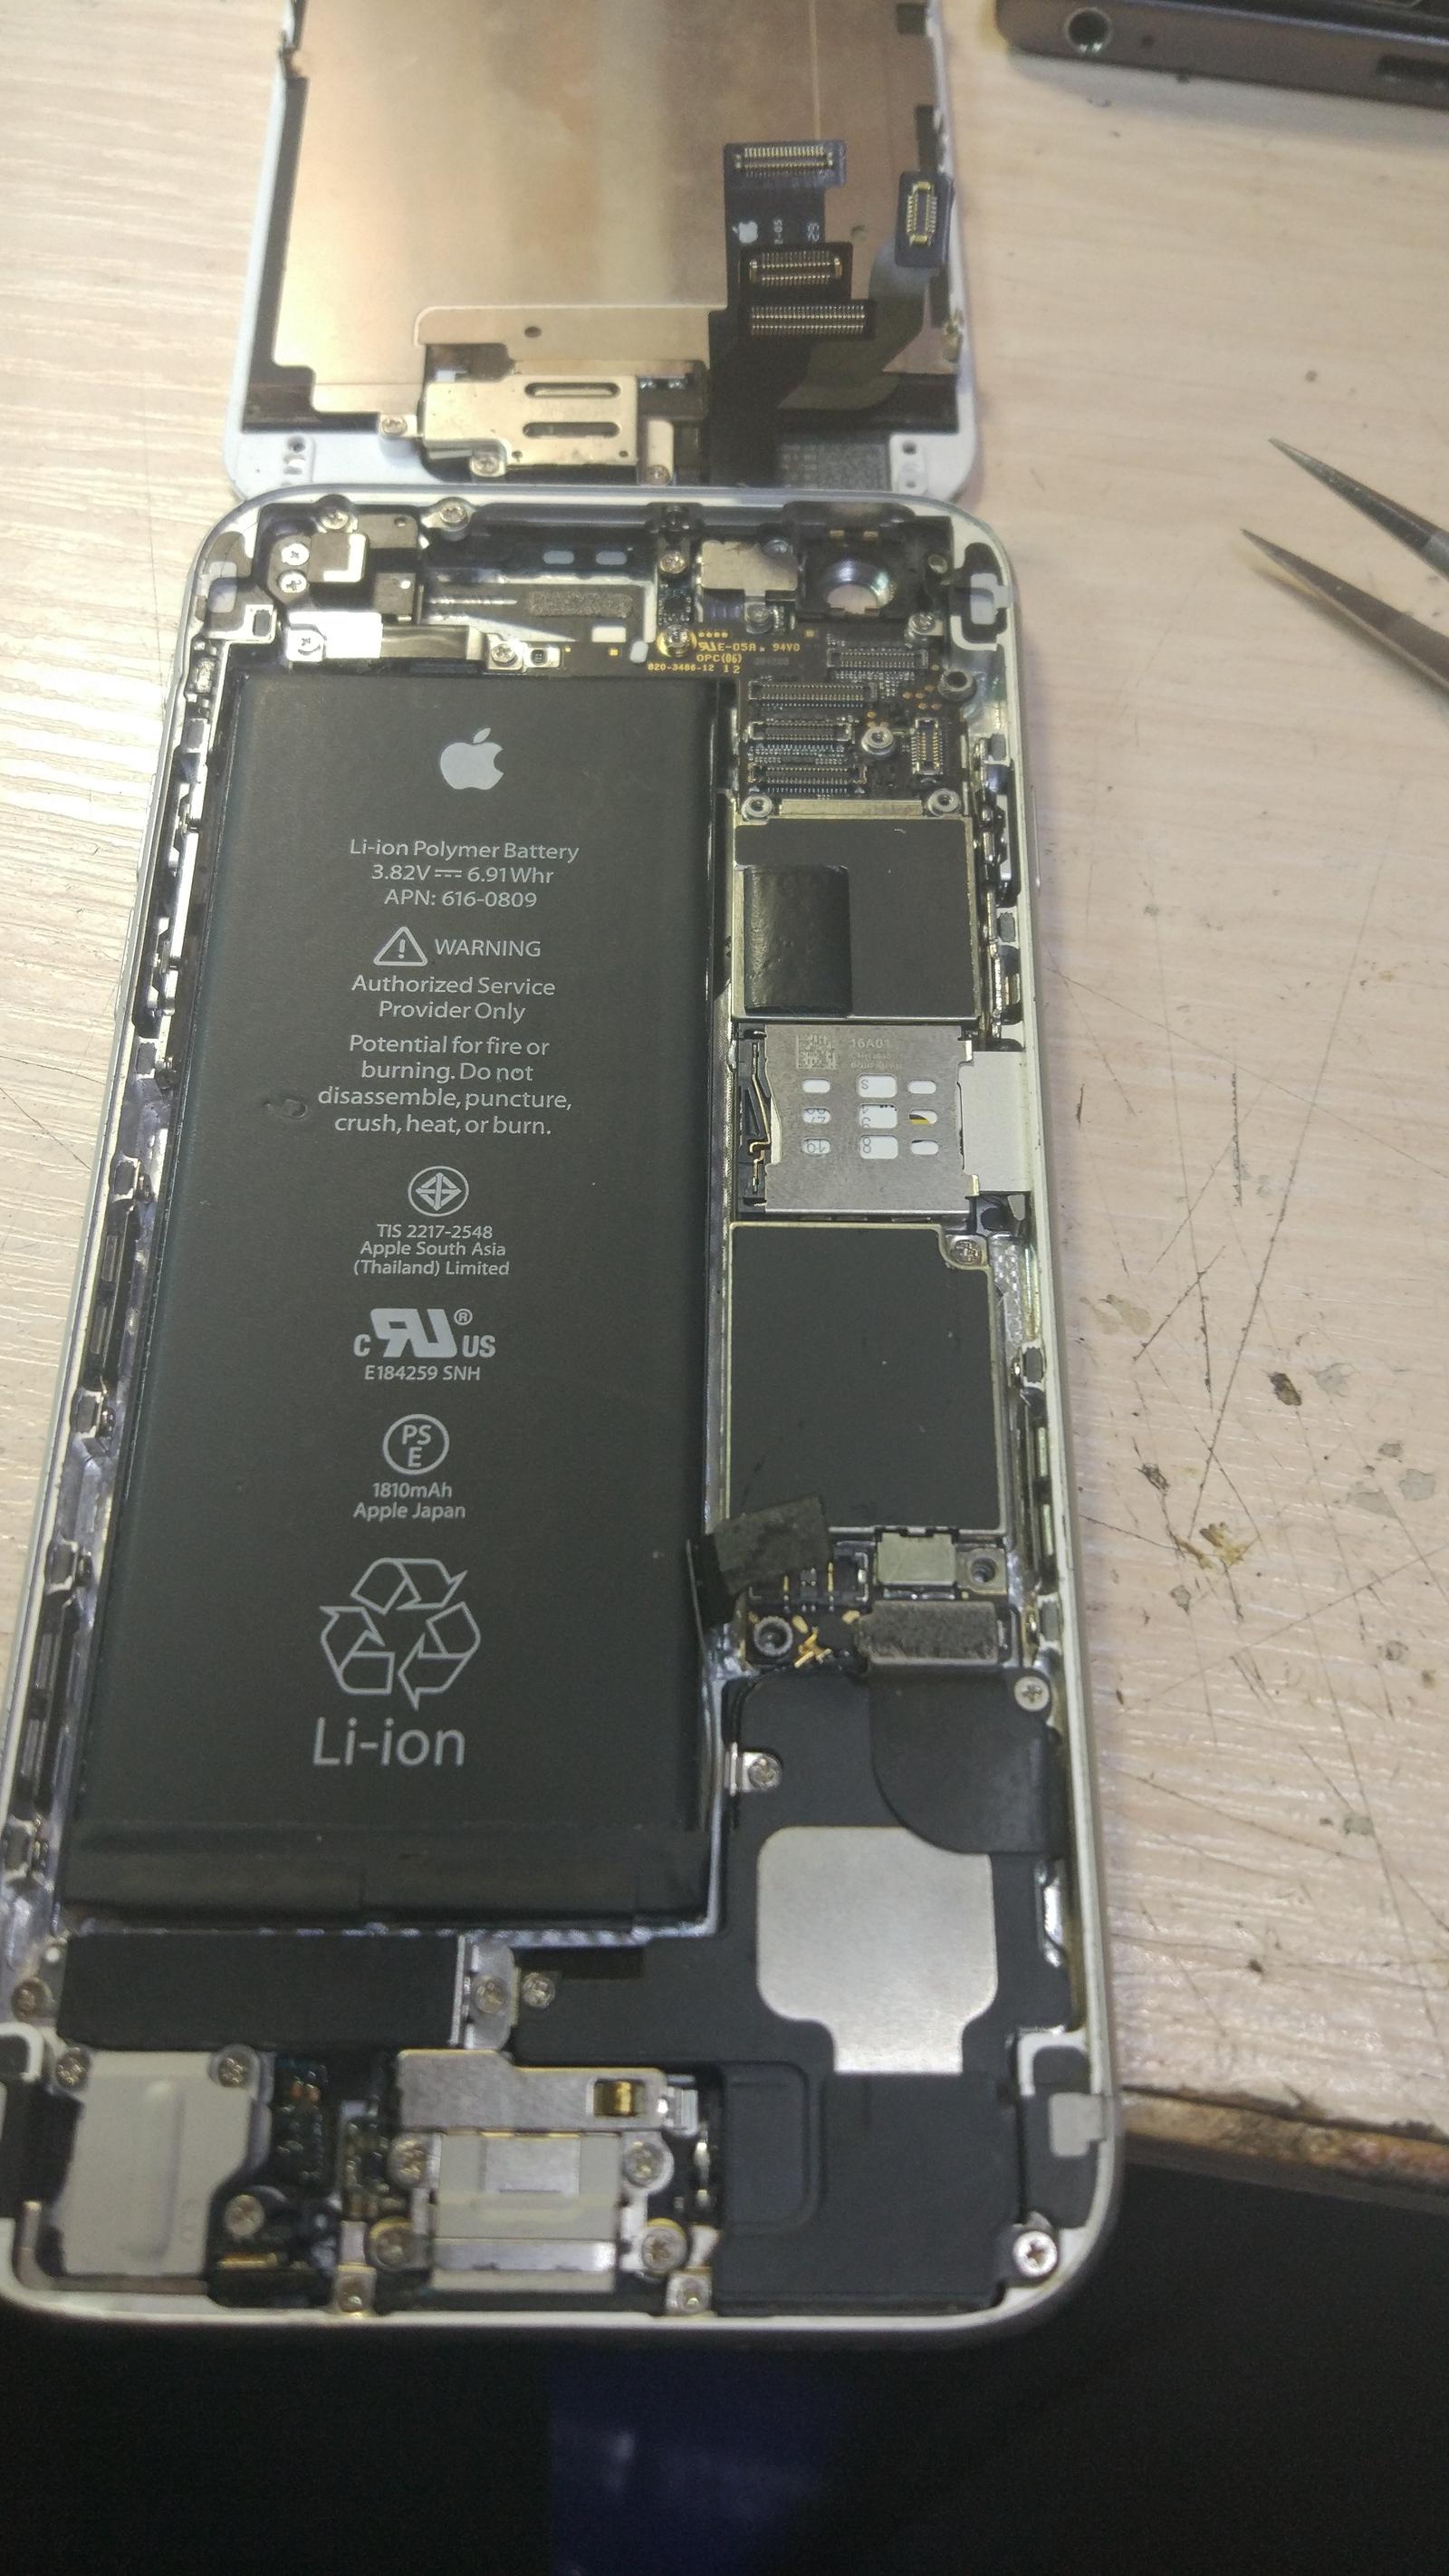 ремонт камеры на айфоне 6s